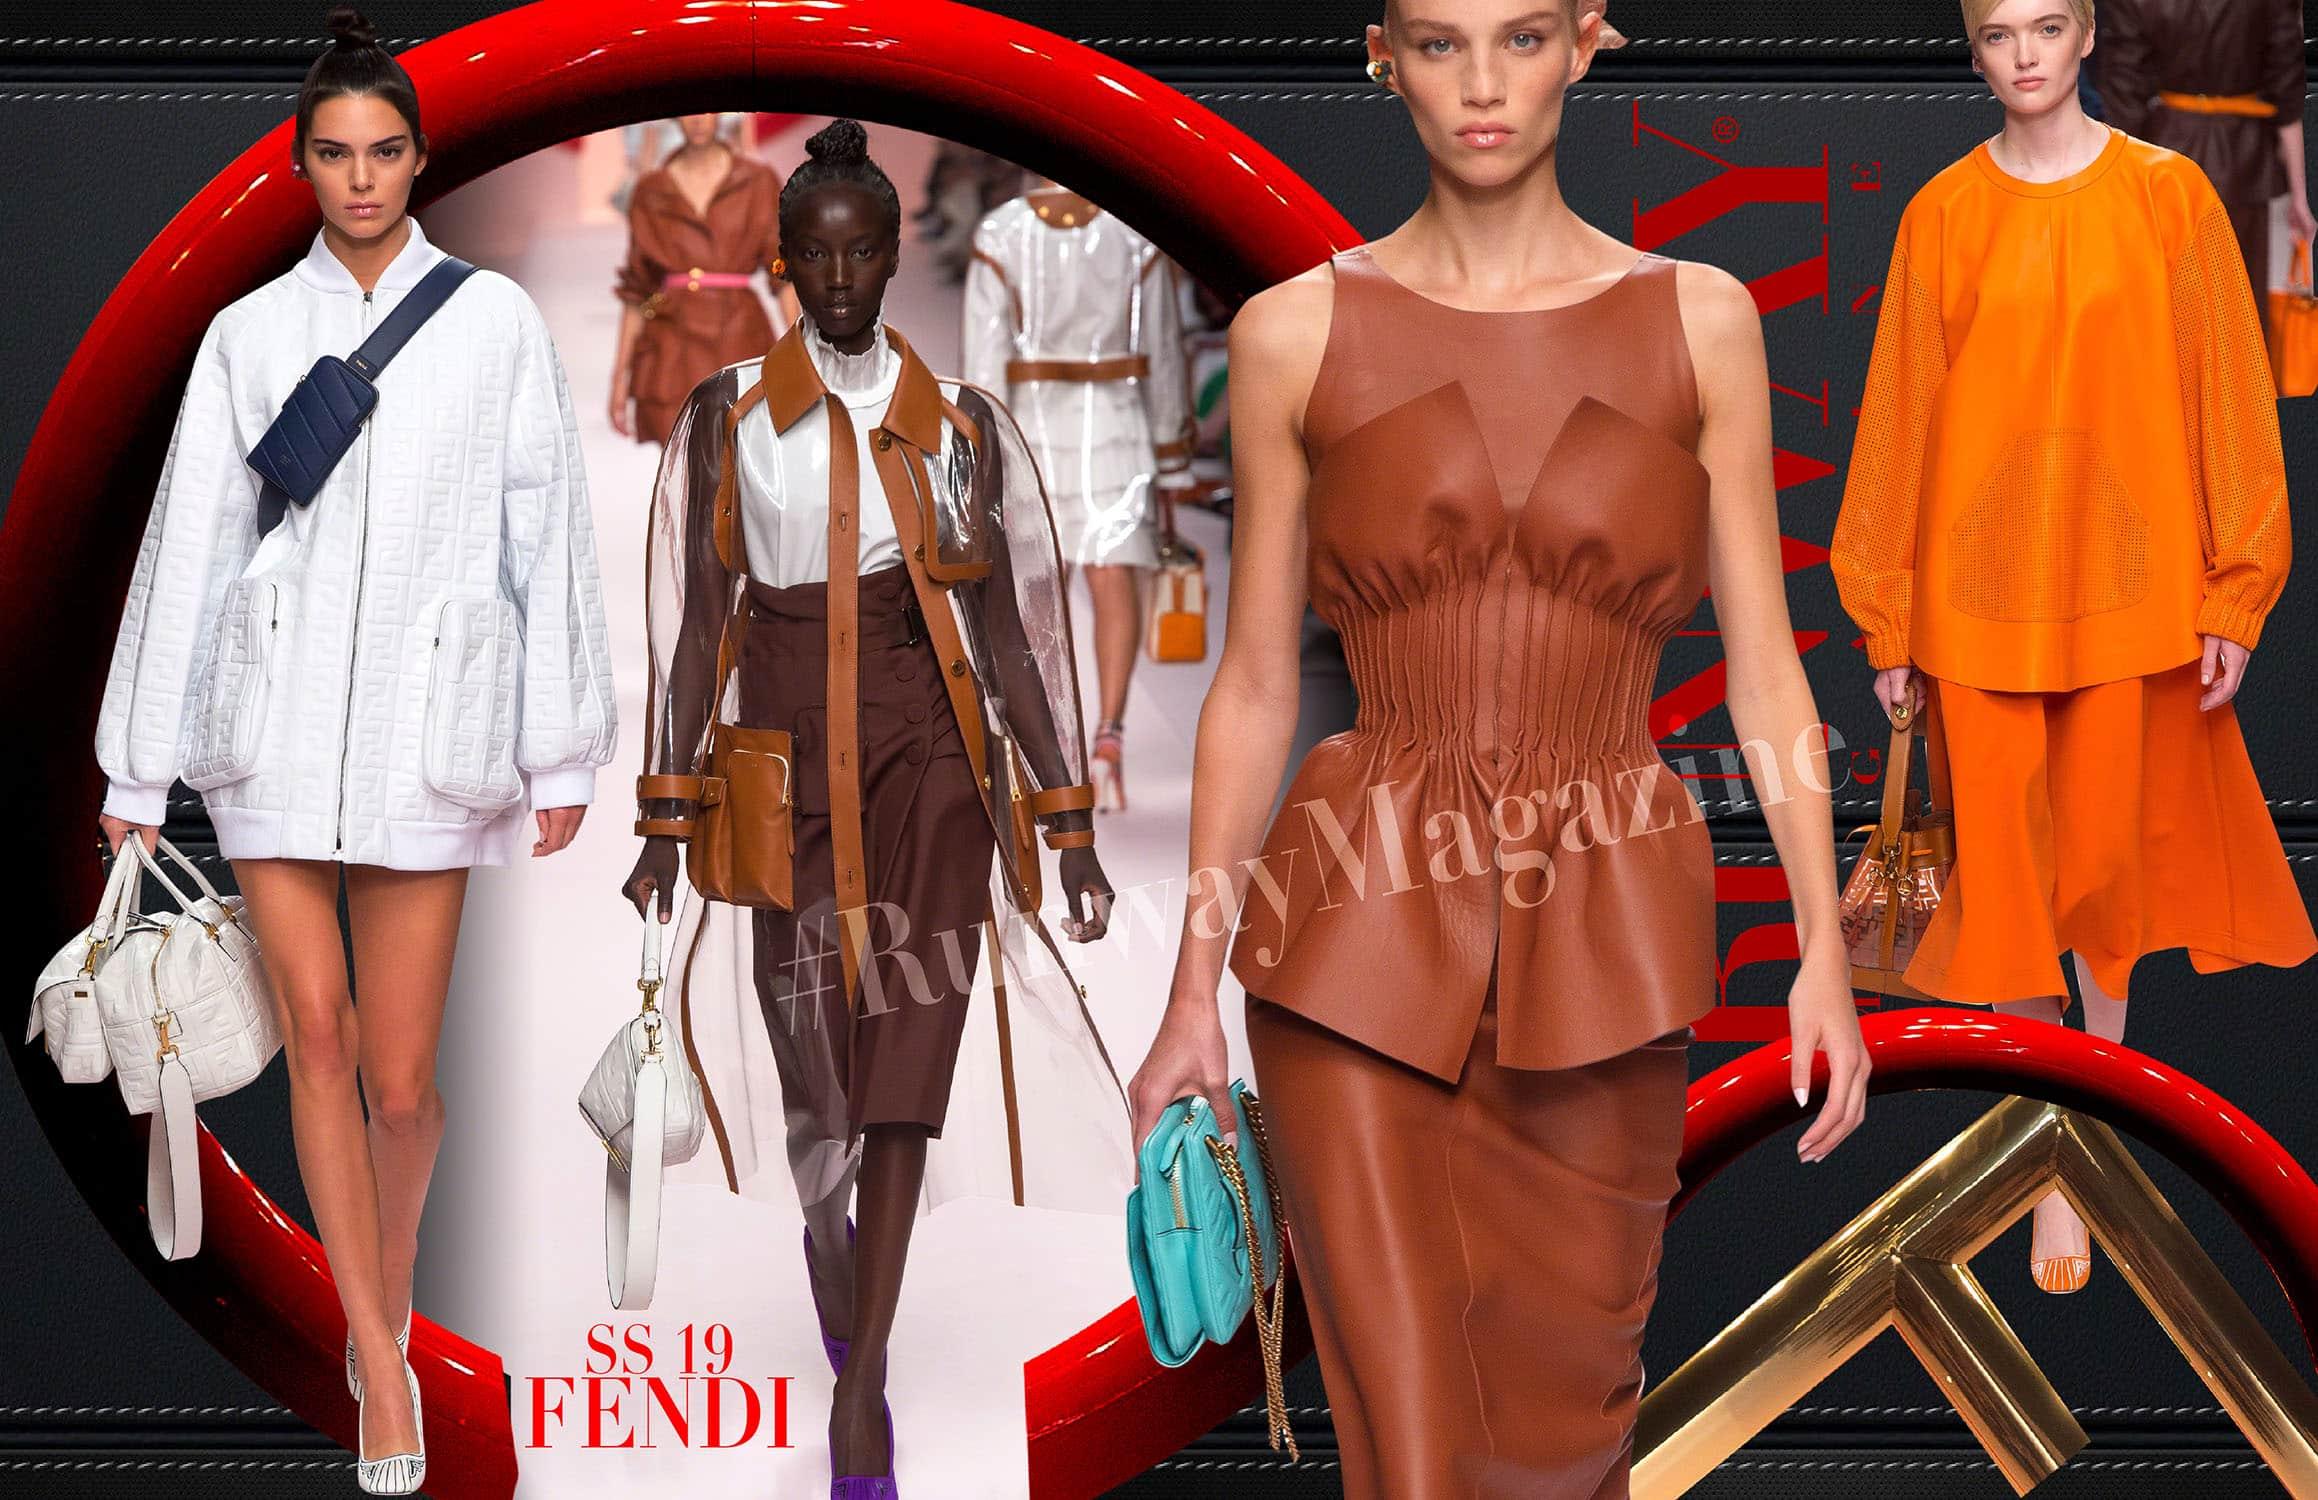 Fendi Spring Summer 2019 Milan Fashion Week by RUNWAY MAGAZINE